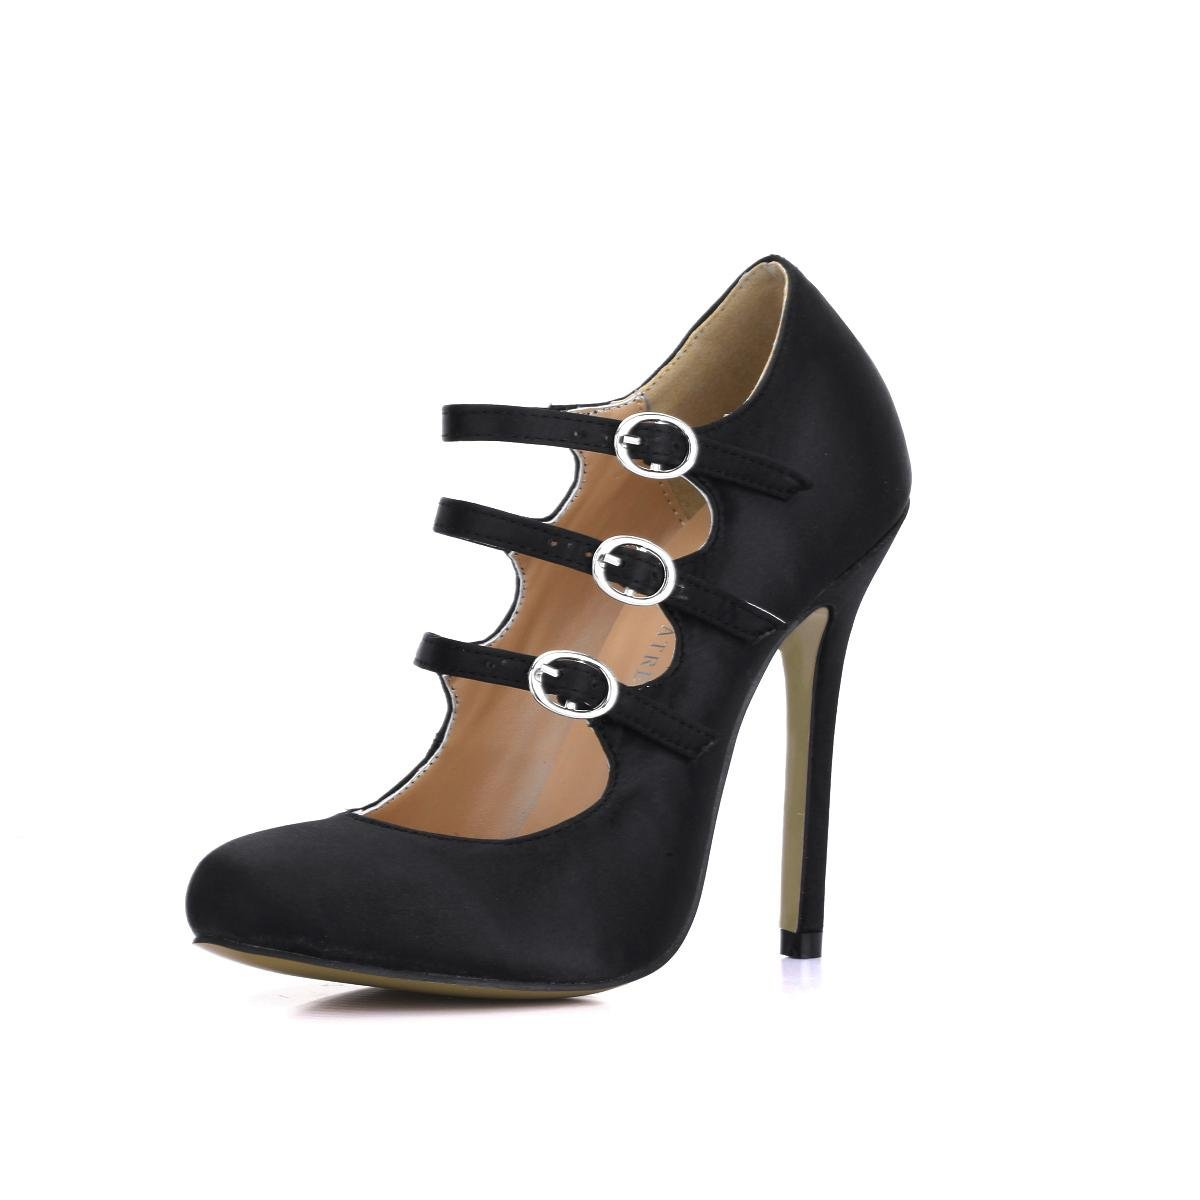 KUKIE Best 4U® Damenschuhe Faux Silk Metall Schnalle Stiletto 12CM High Heels Spitzschuh Frühling Sommer Schuhe schwarz